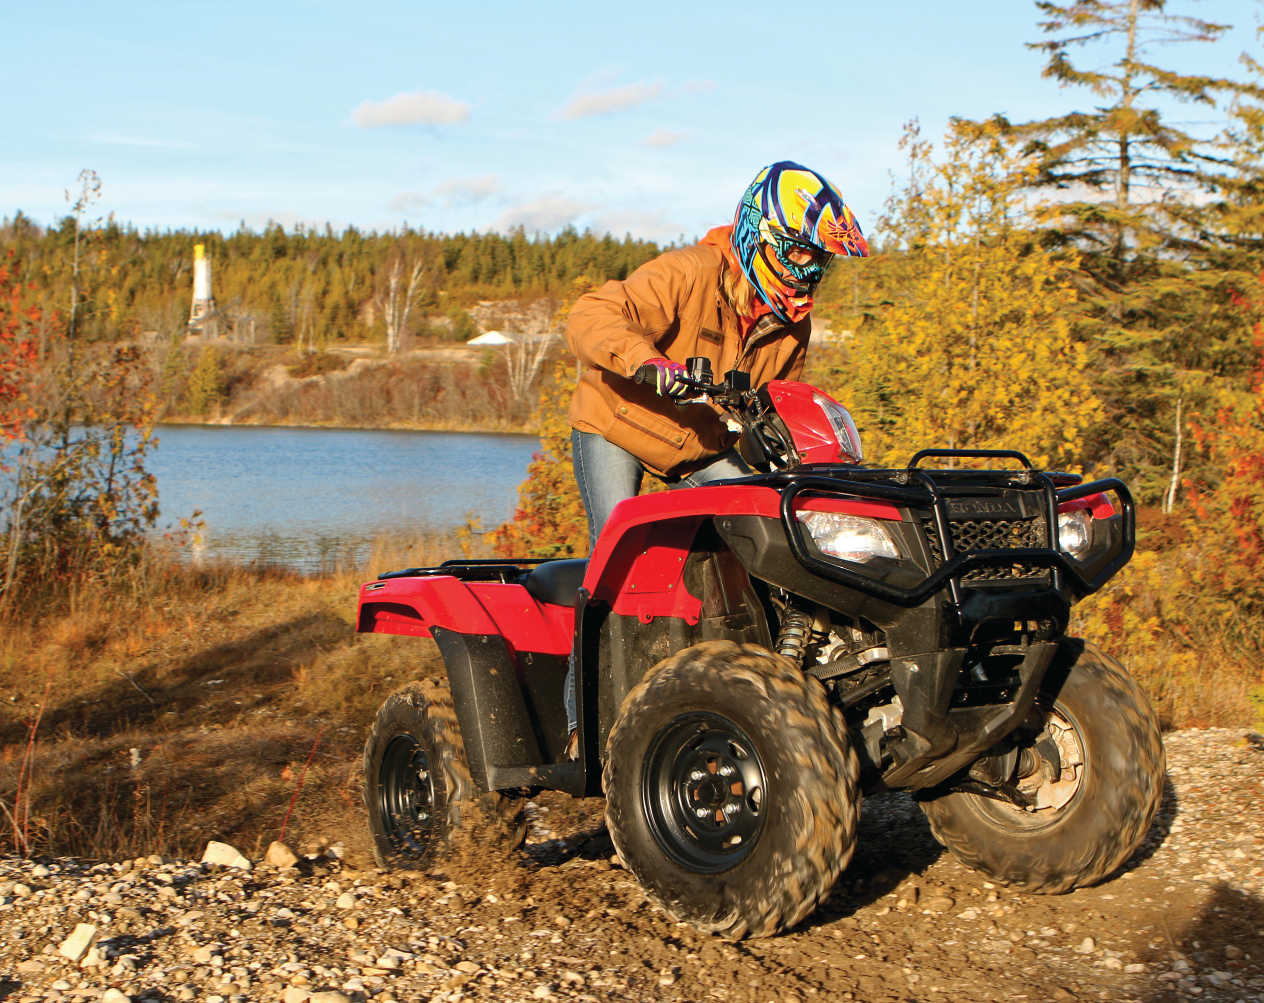 Ride Report - The Honda Fourtrax Foreman Rubicon | ATV Illustrated